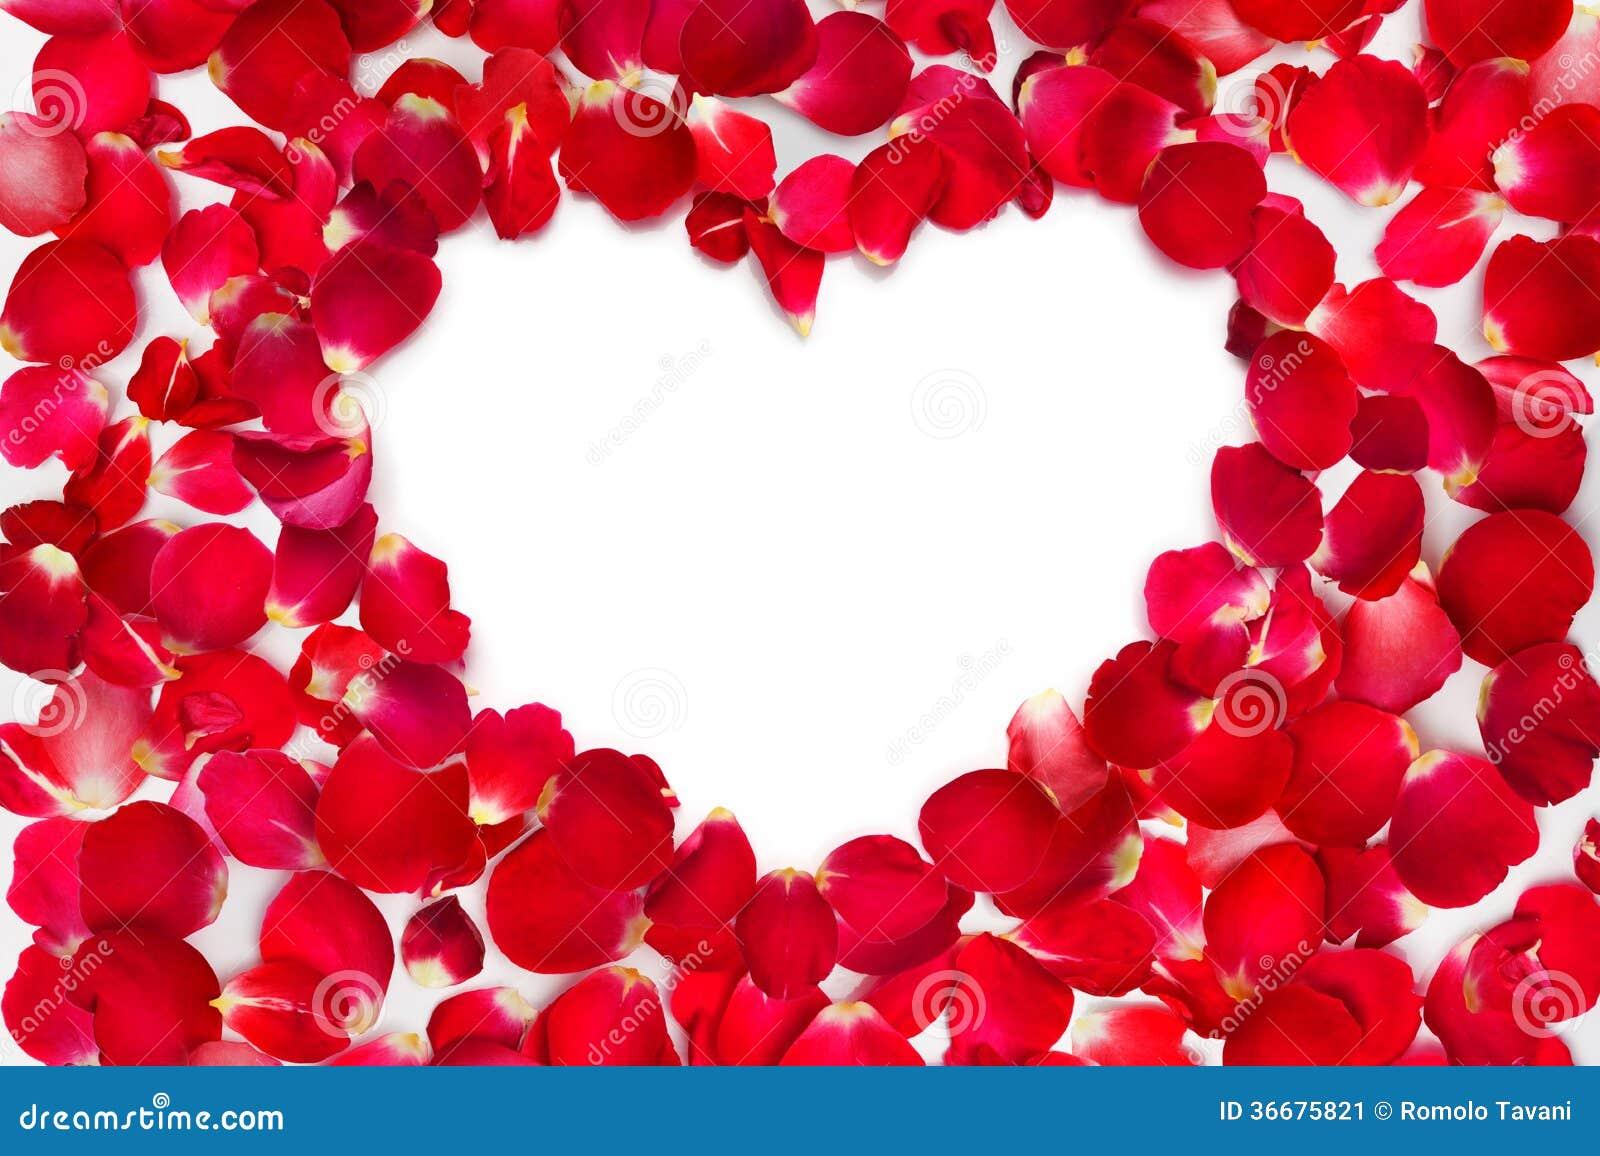 p tales de rose de coeur cadre image stock image 36675821. Black Bedroom Furniture Sets. Home Design Ideas